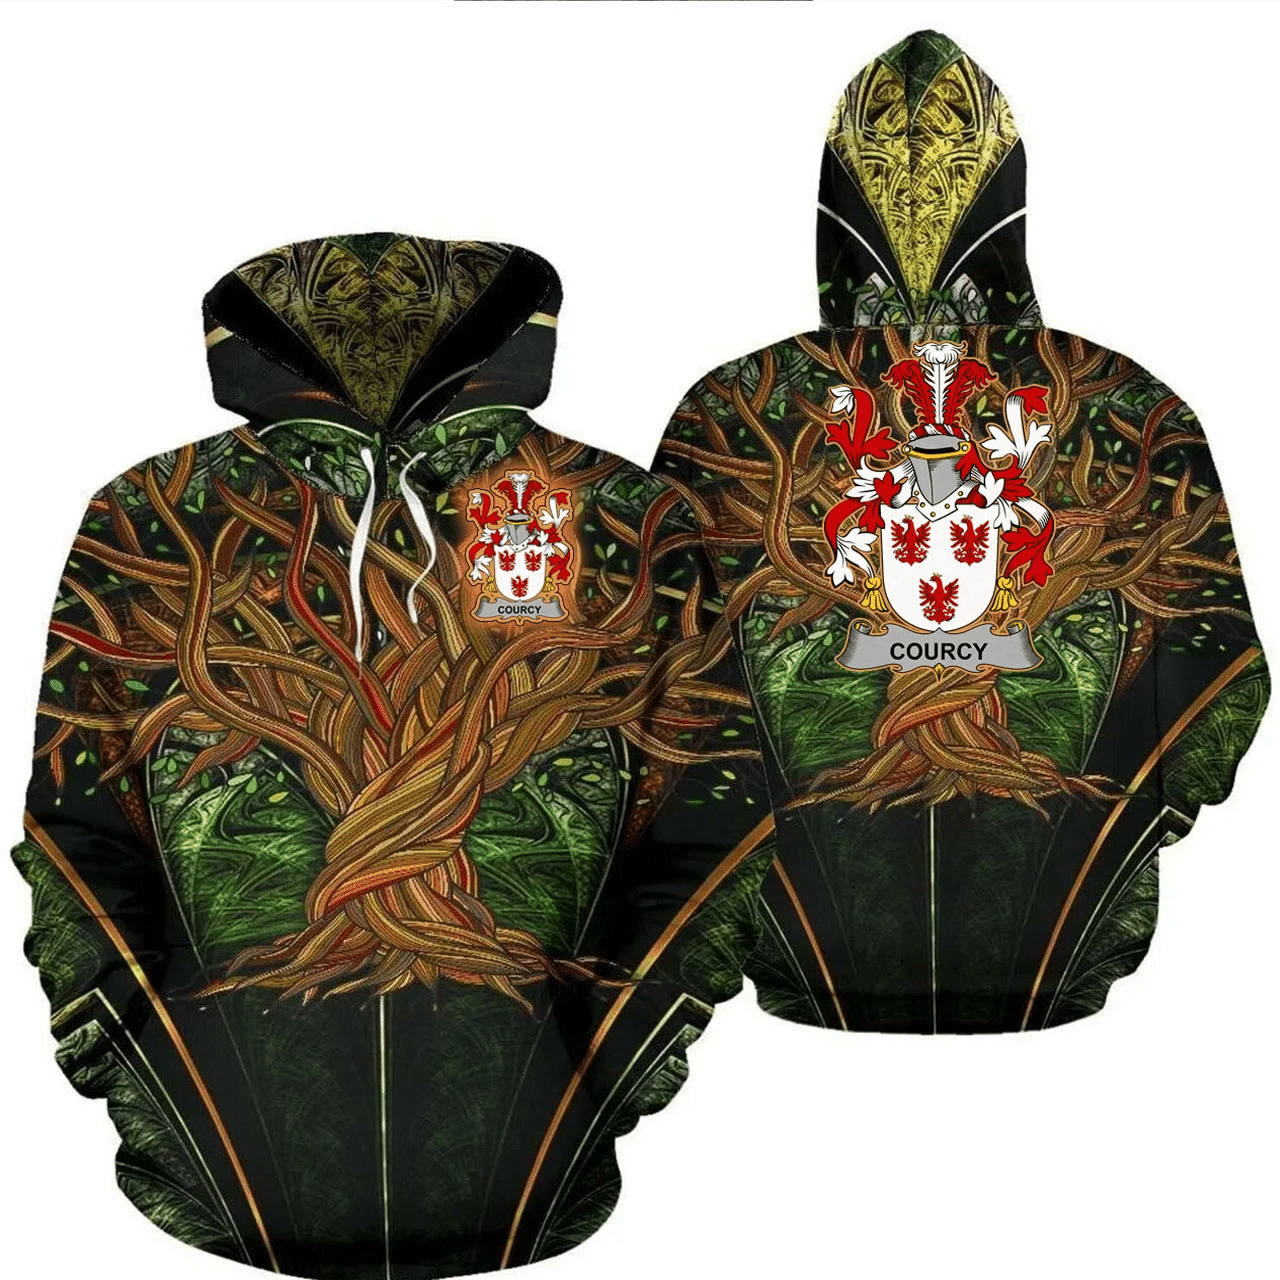 1stIreland Ireland Hoodie - Courcy (de) Lord Kingsale Irish Family Crest Hoodie - Tree Of Life A7